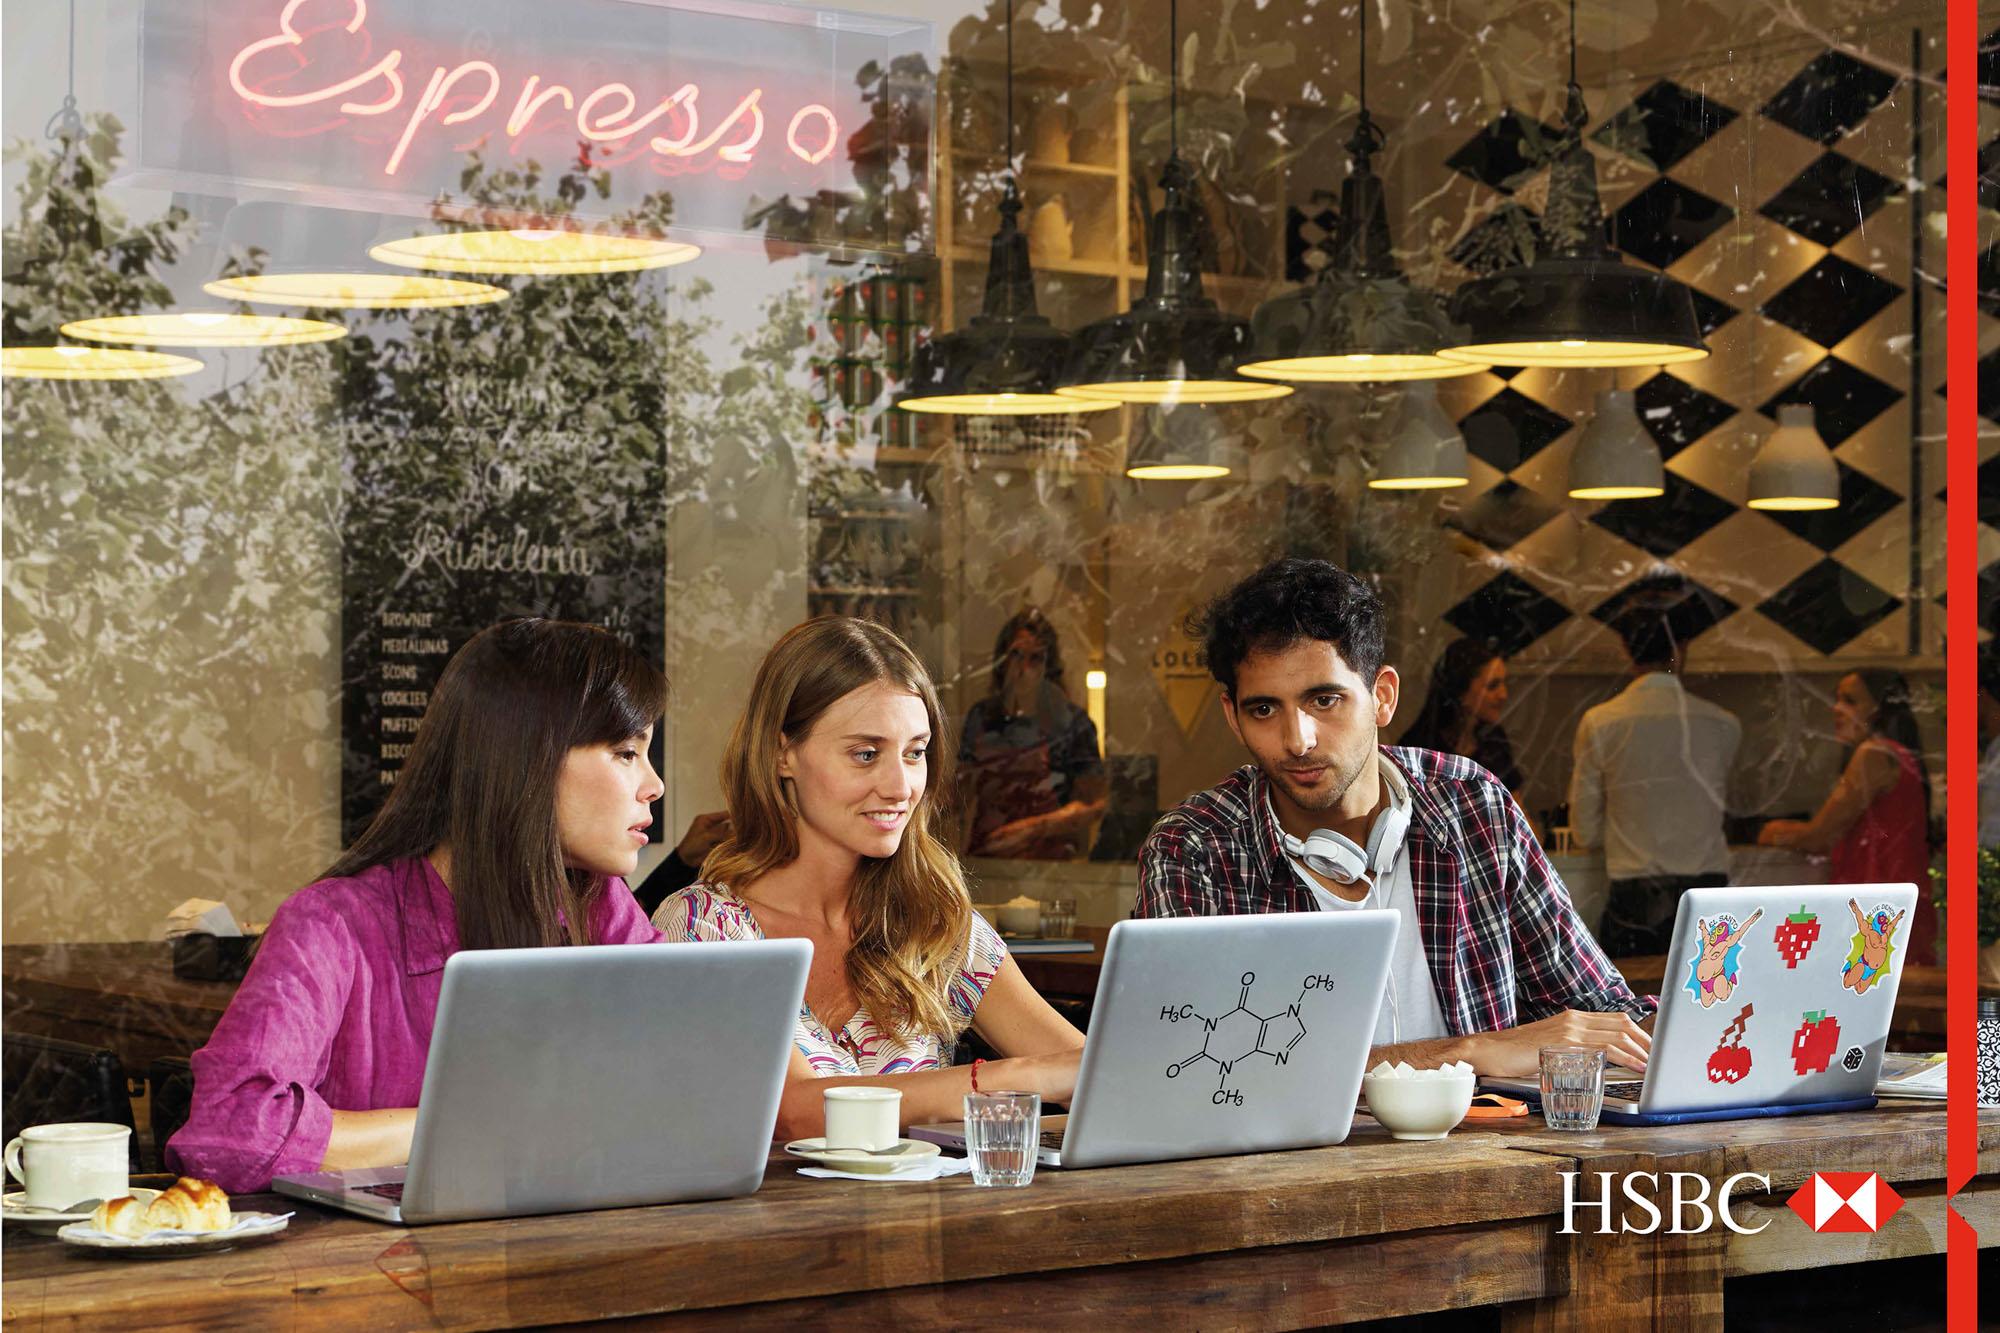 henrik-knudsen-advertising-hsbc-08.jpg